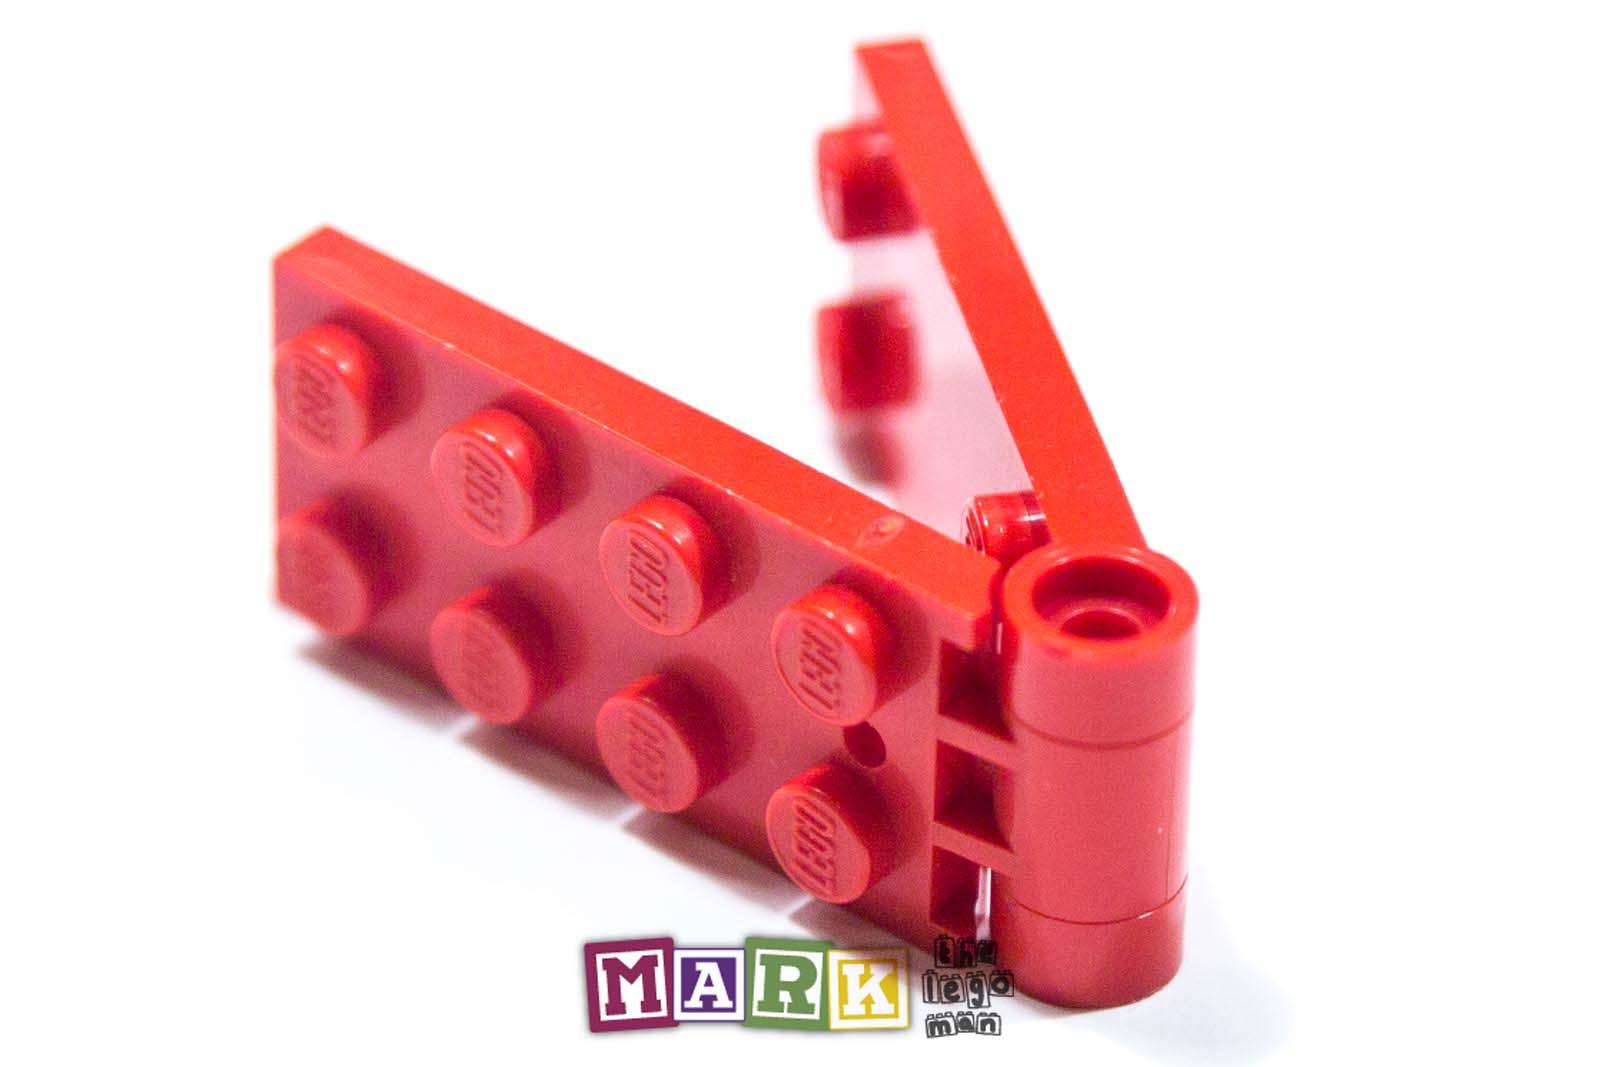 lego 3149c01 2 5 hinge plate complete assembly 3149c01 mad about bricks. Black Bedroom Furniture Sets. Home Design Ideas